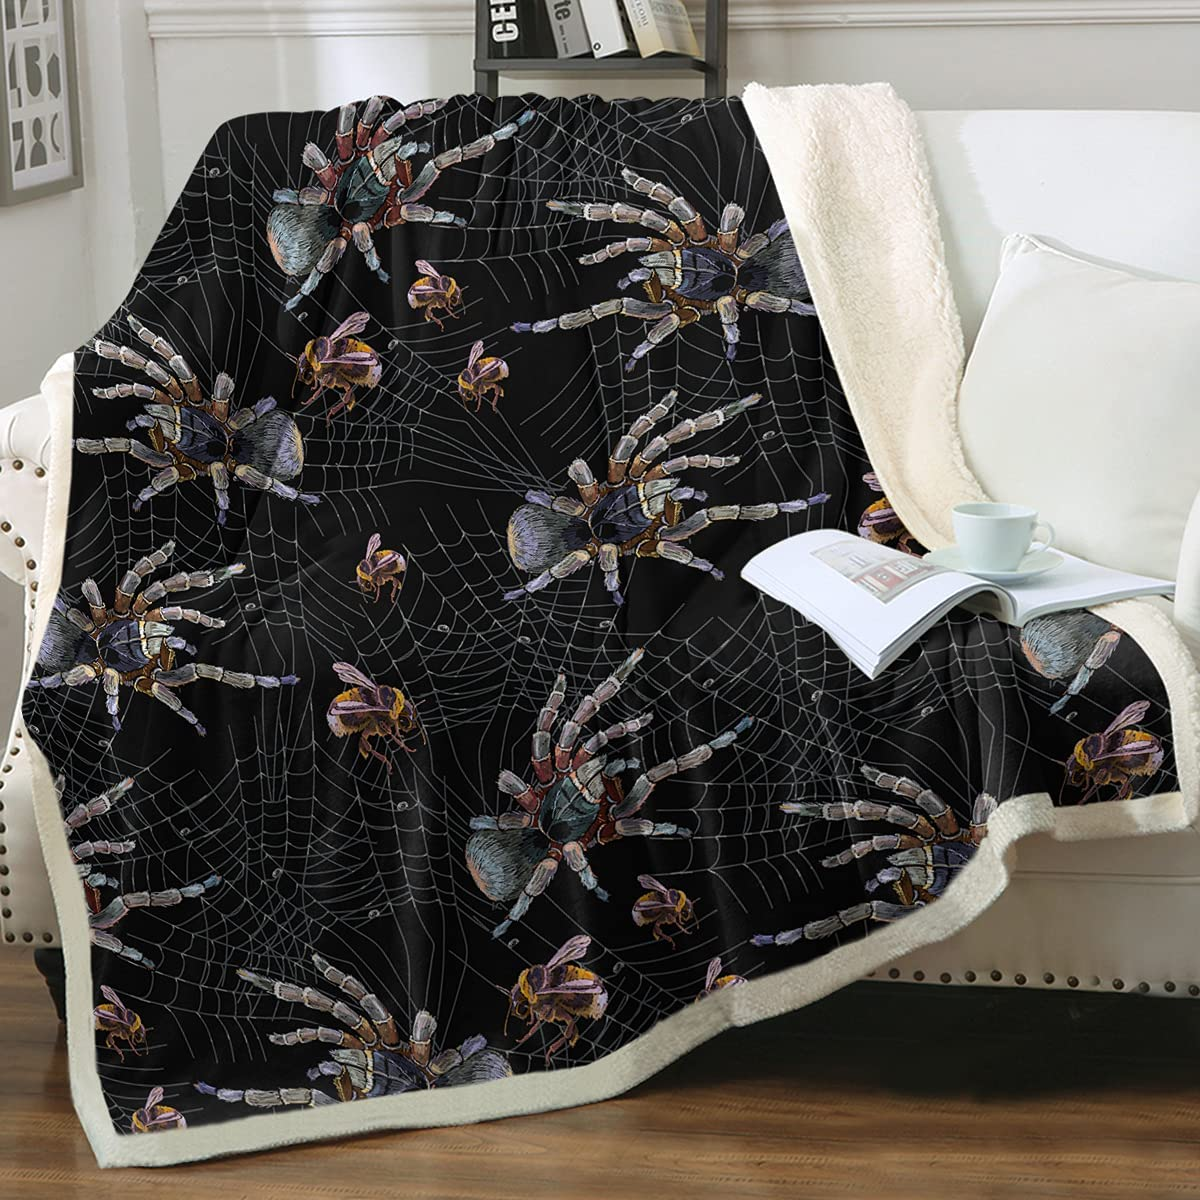 Sleepwish Spider Web Sherpa Throws 3D King 108